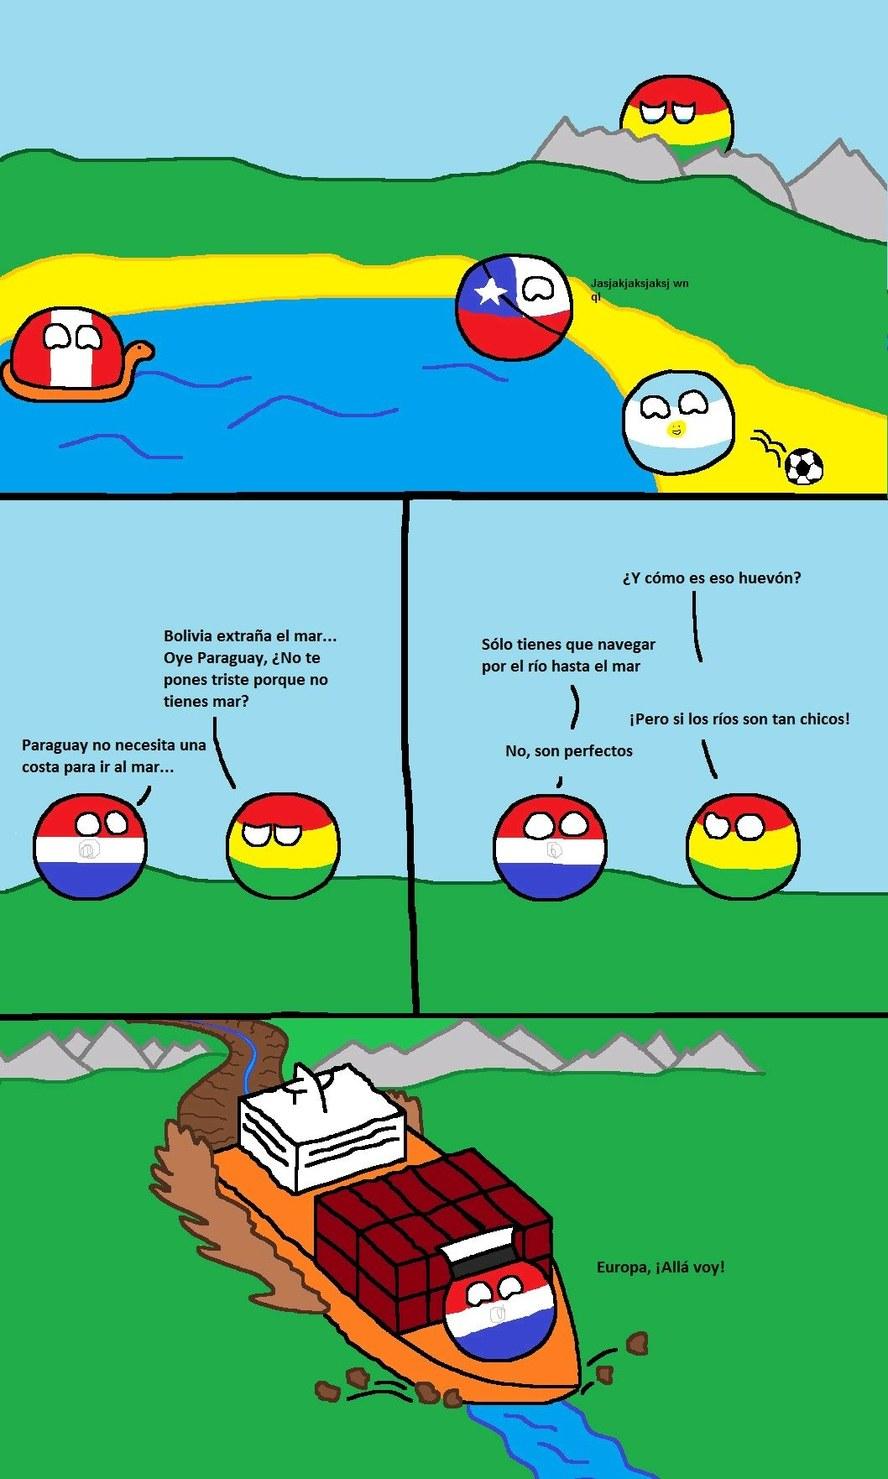 Tenemos el Río Paraguay para salir - meme